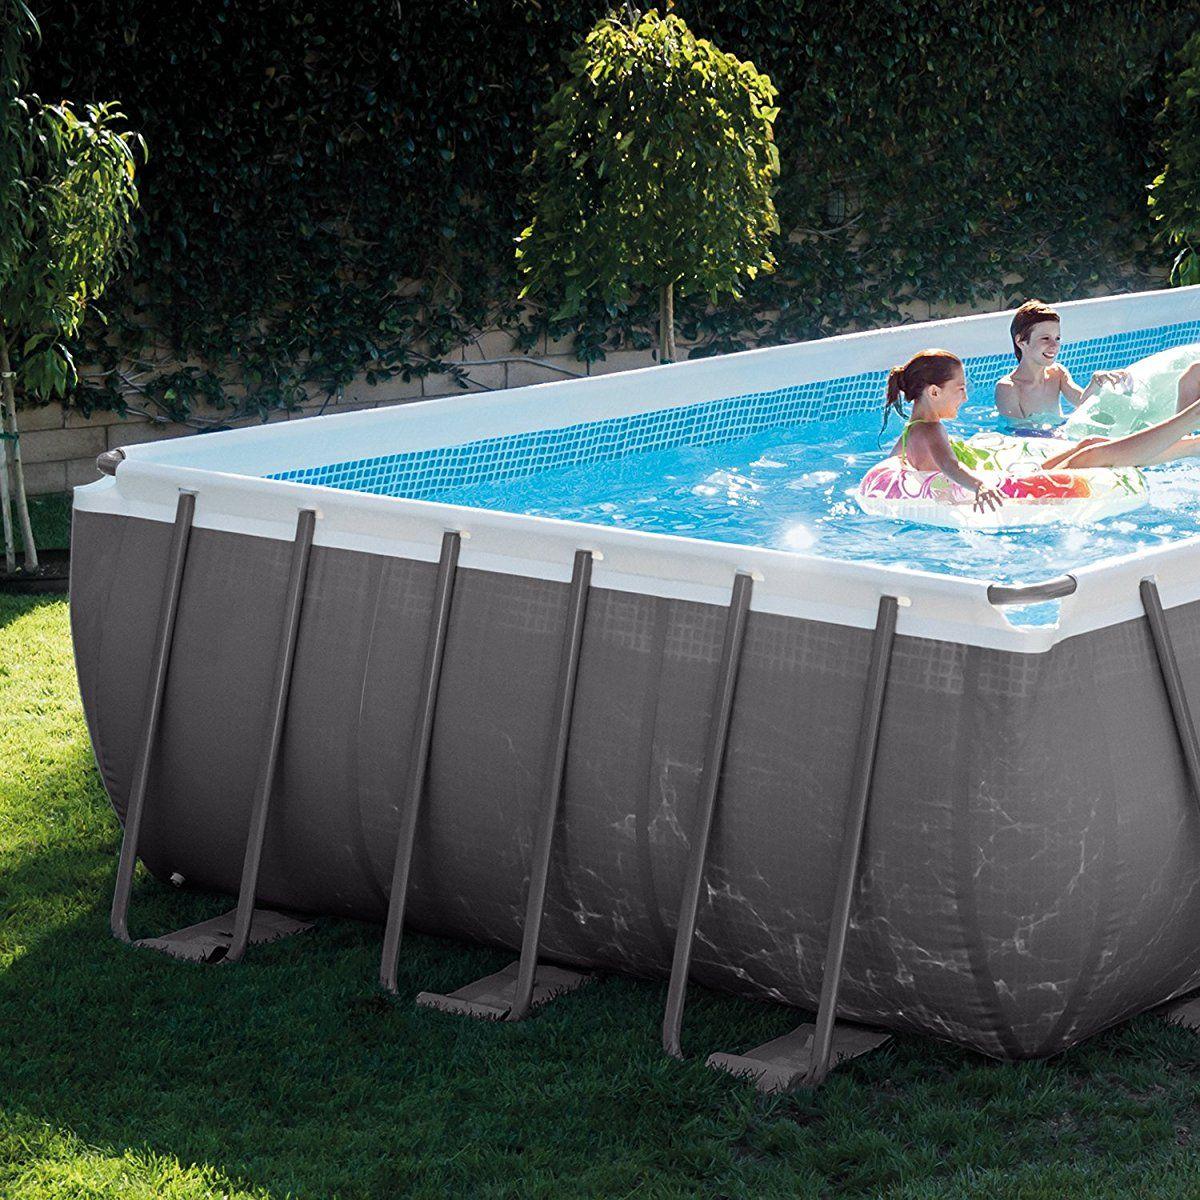 Intex Rectangular Ultra Frame Pool Set 24 Feet By 12 Feet By 52 Inch Rectangular Pool Intex Radiant Pools